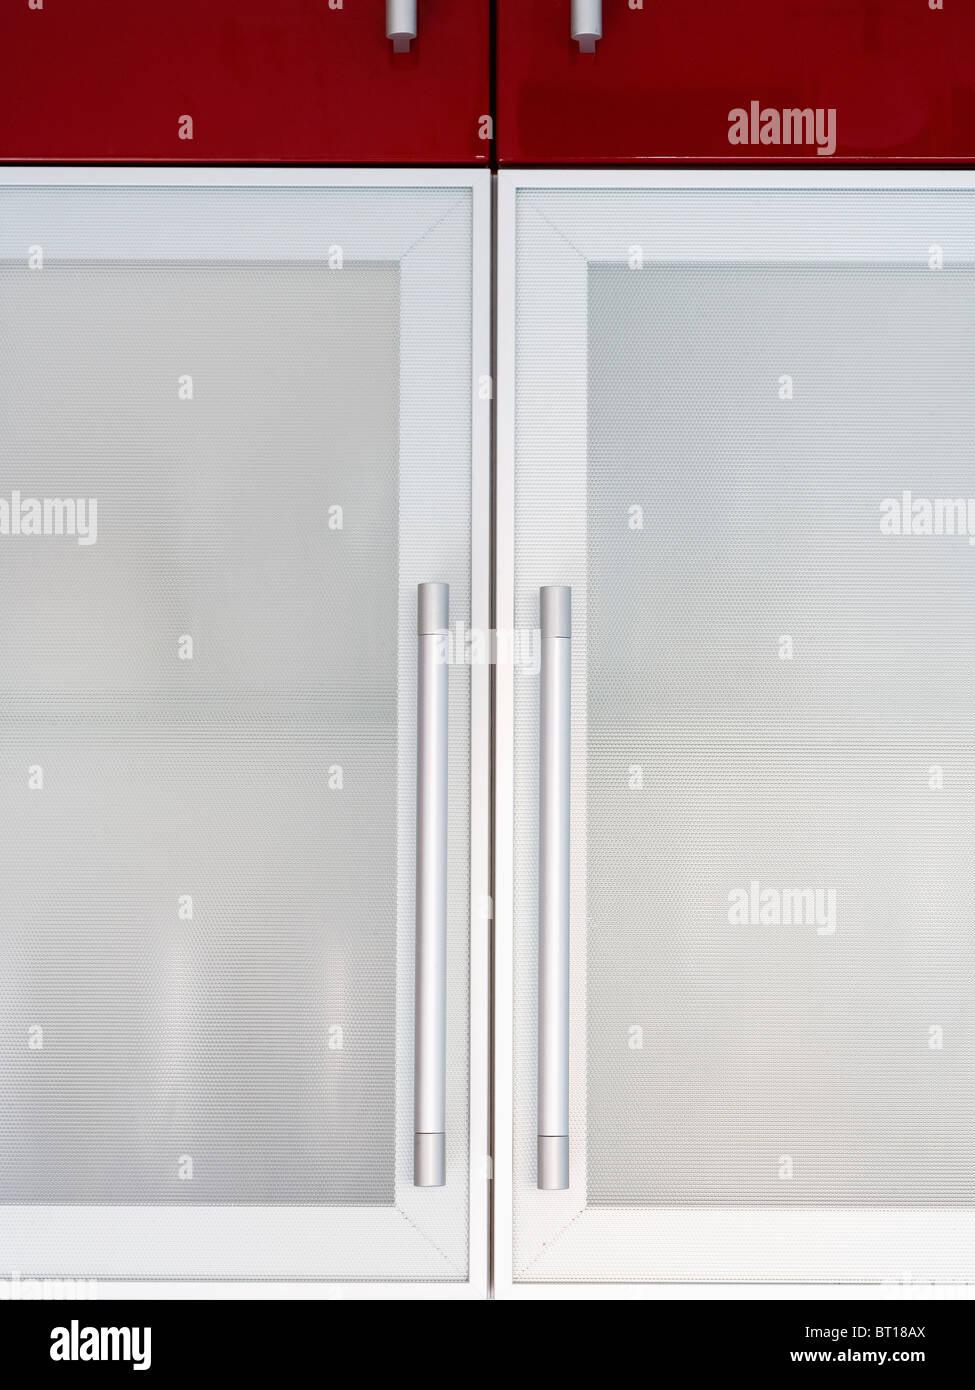 Ante Vetro Cucina close-up di cucina credenza con ante vetro opaco porte con